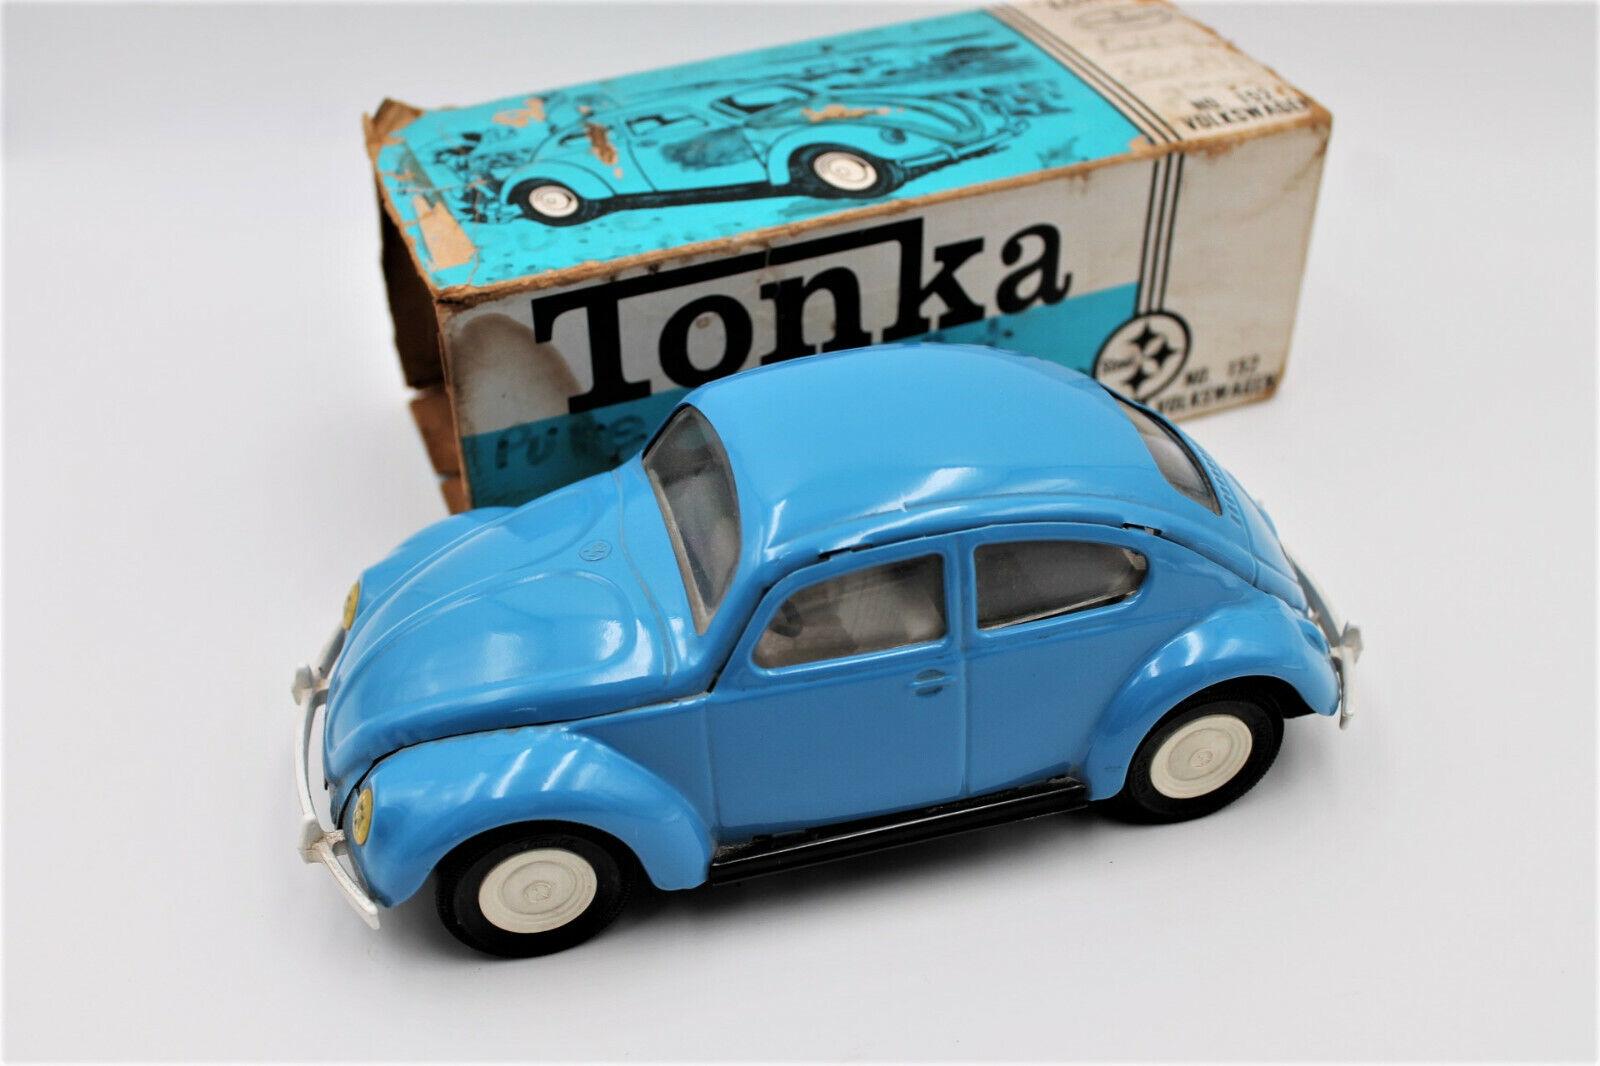 Rare Vintage 1960s Tonka Volkswagen Kafer Beetle Pressed Steel VW Toy W/ Box - $135.50